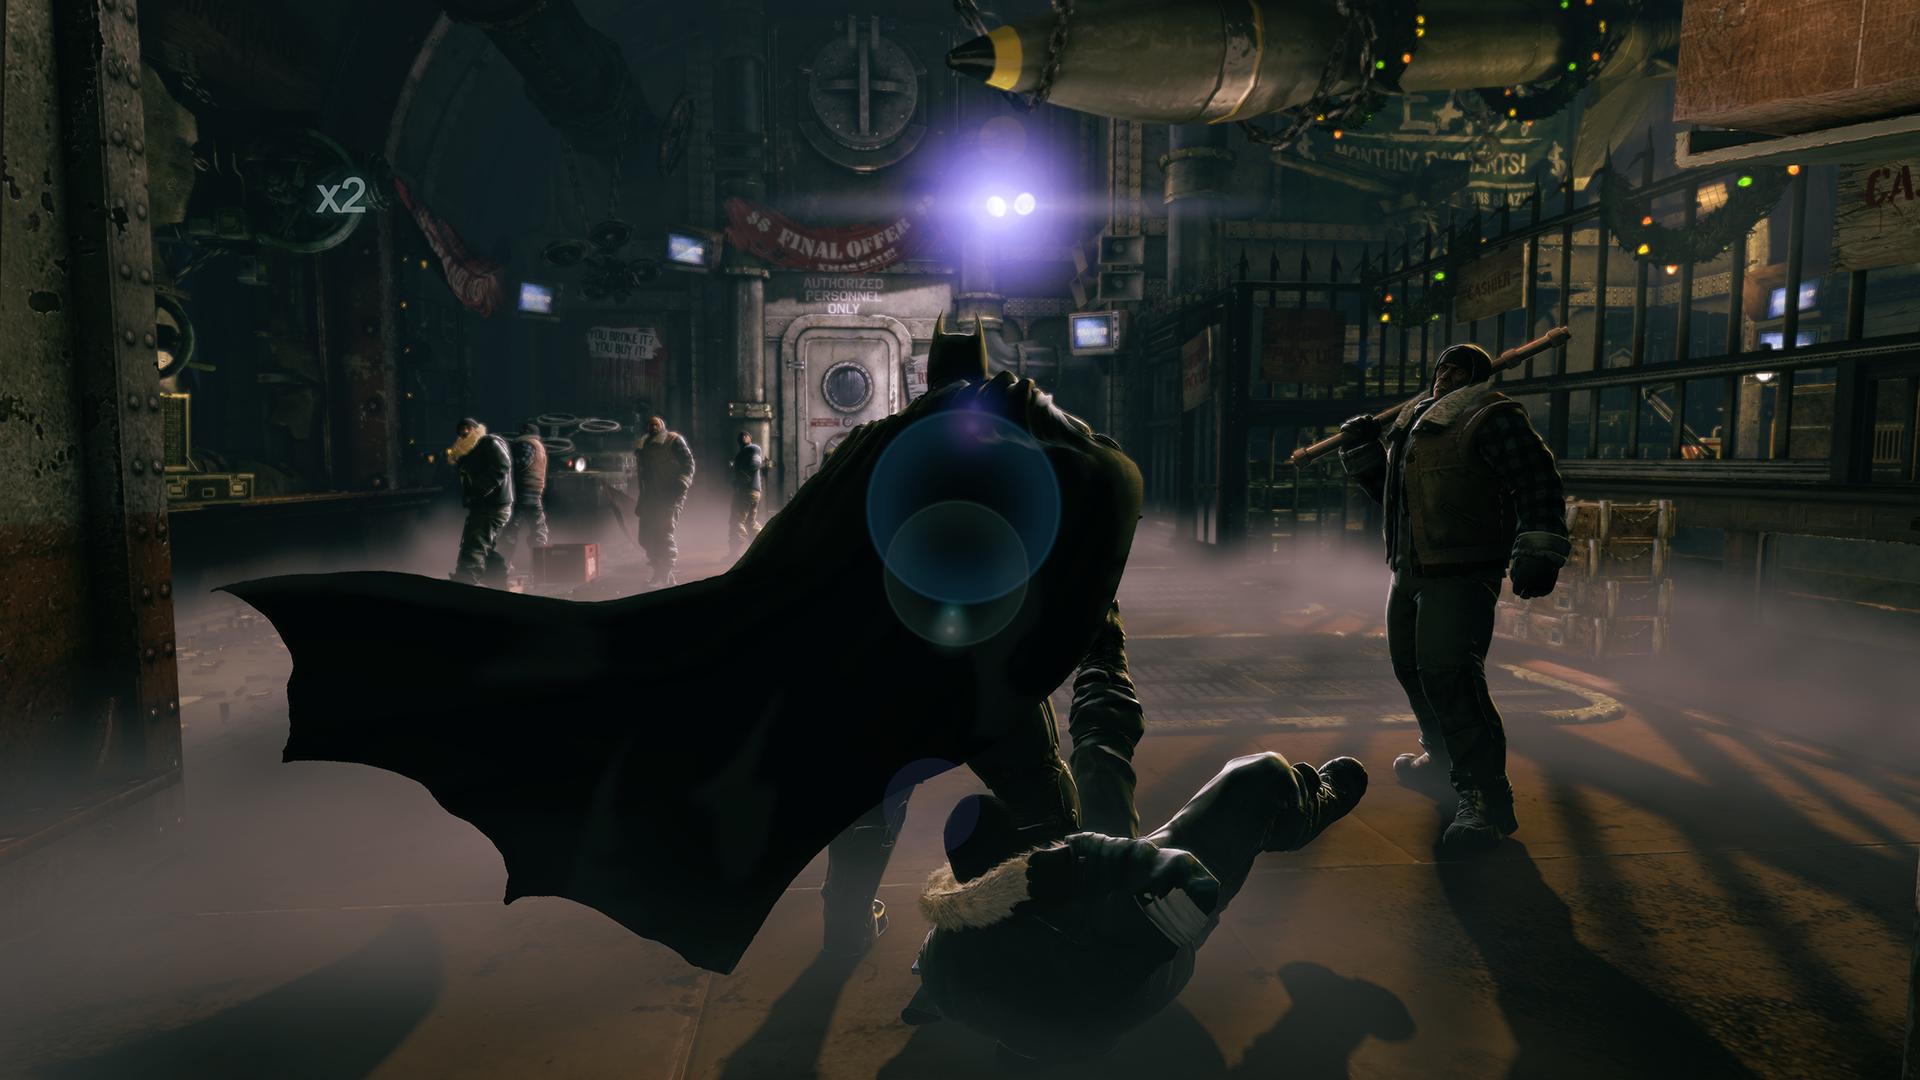 Batman Arkham Origins Lens Flare Screenshot